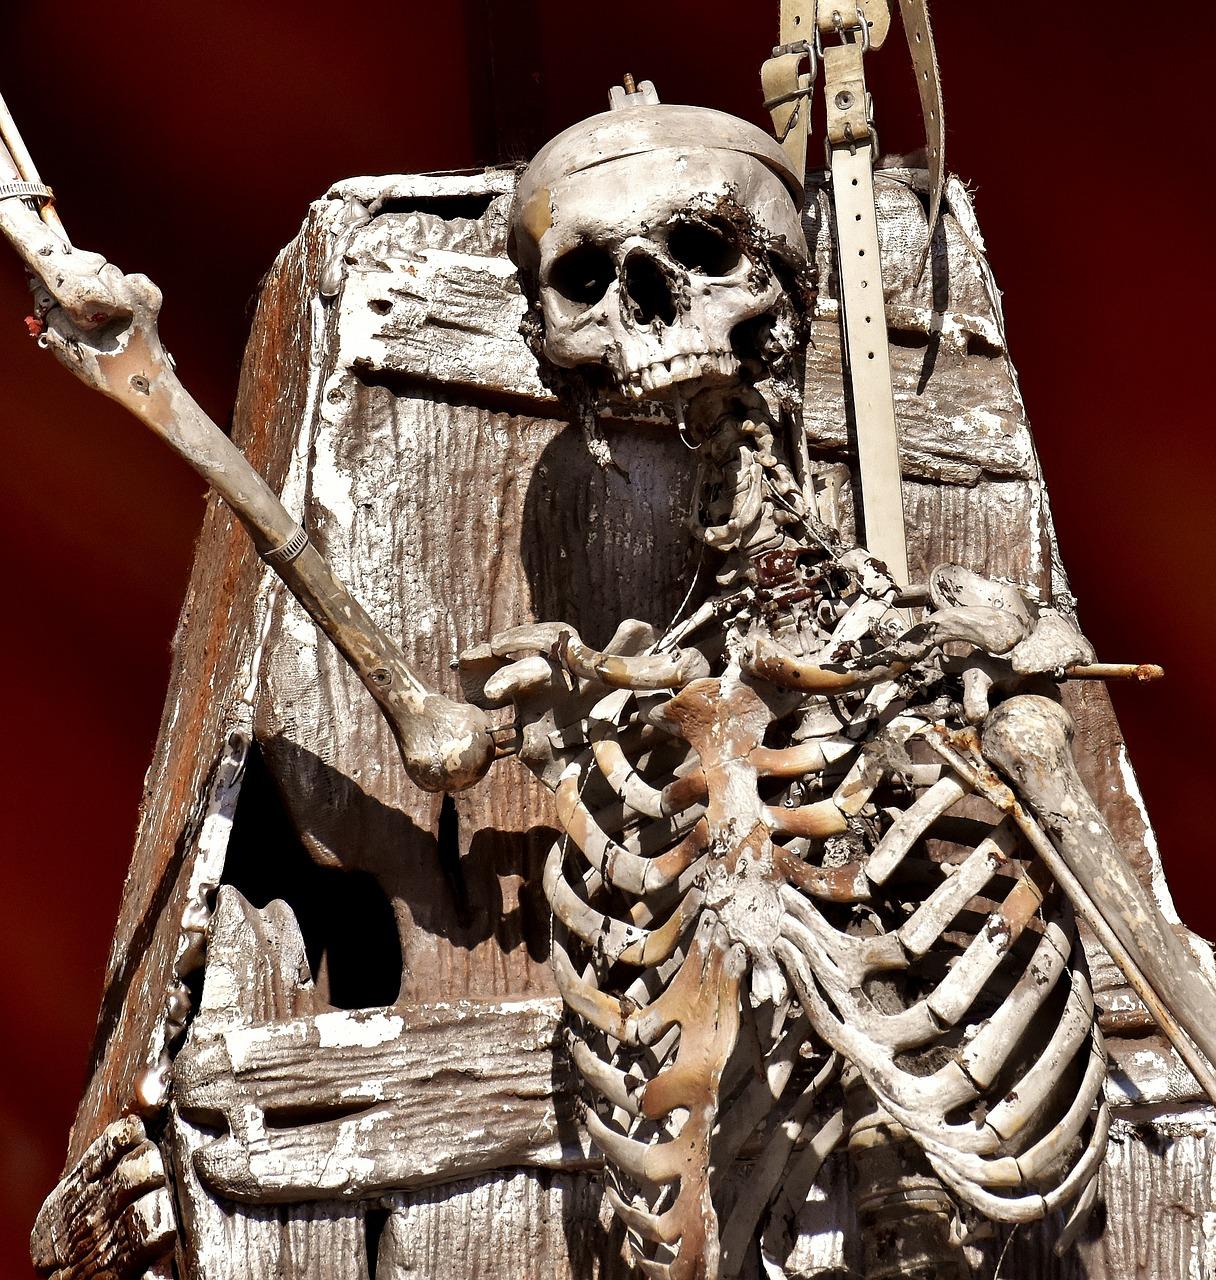 фото скелетов календарь